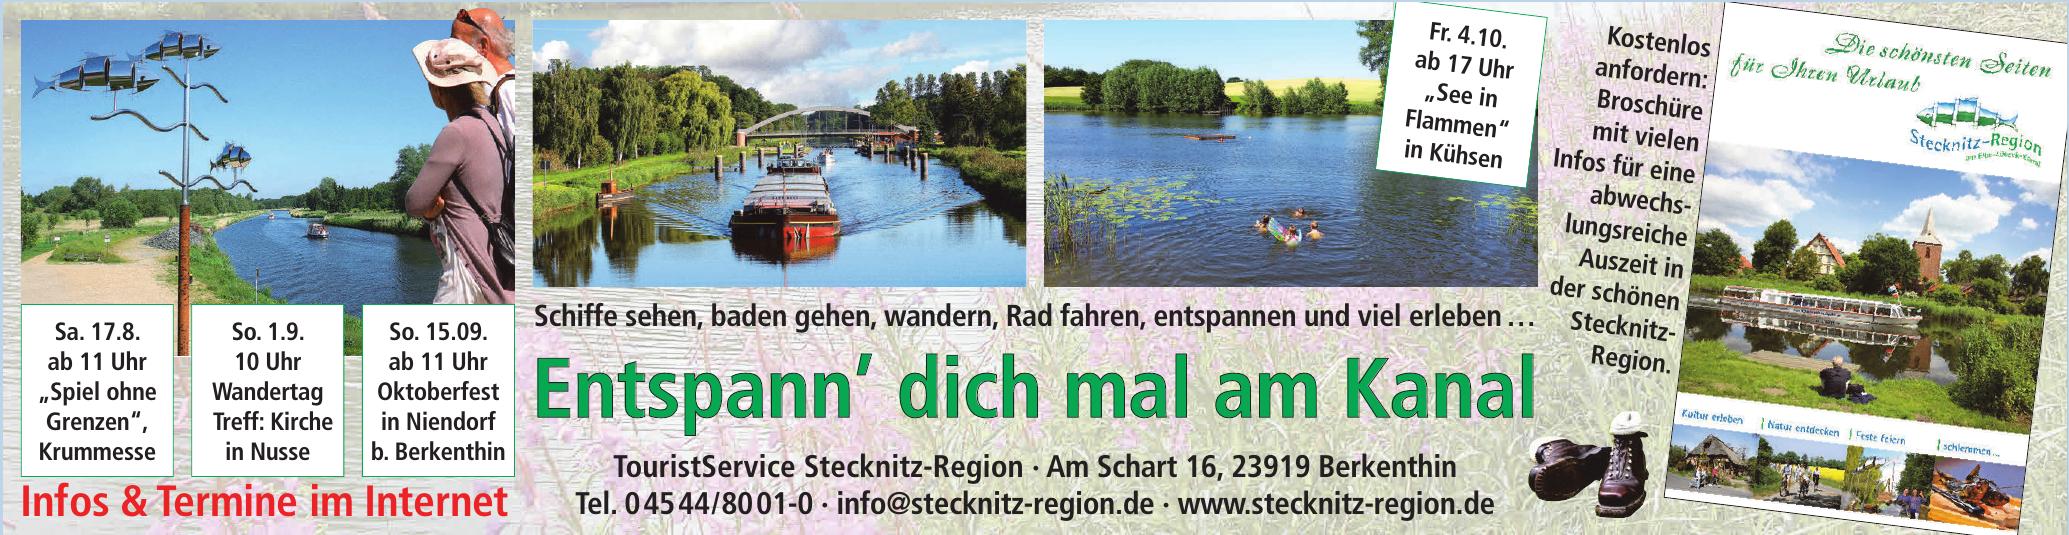 TouristService Stecknitz-Region